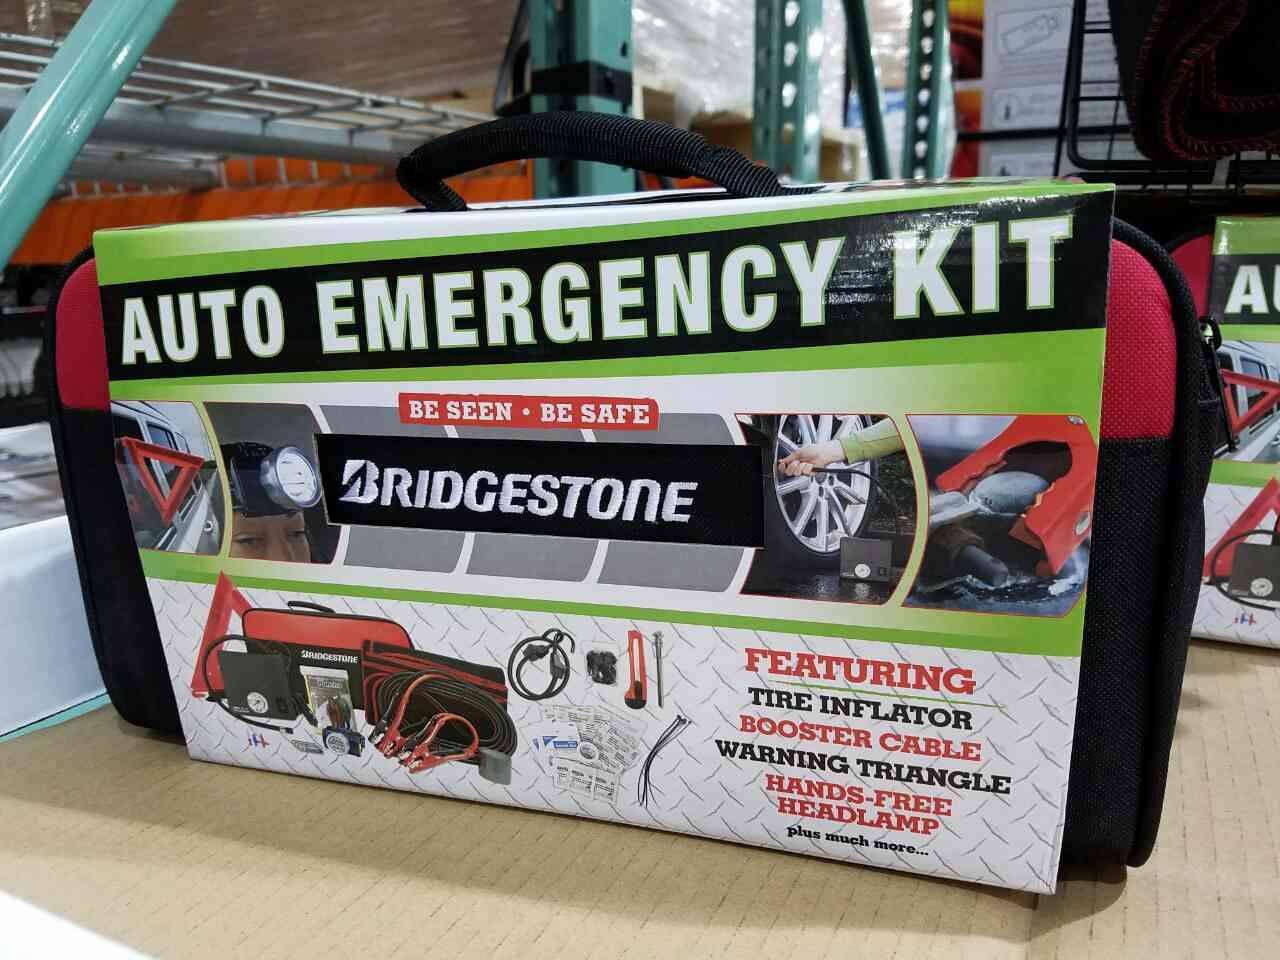 Bridgestone Auto Emergency Kit $19.99 in store @ Costco